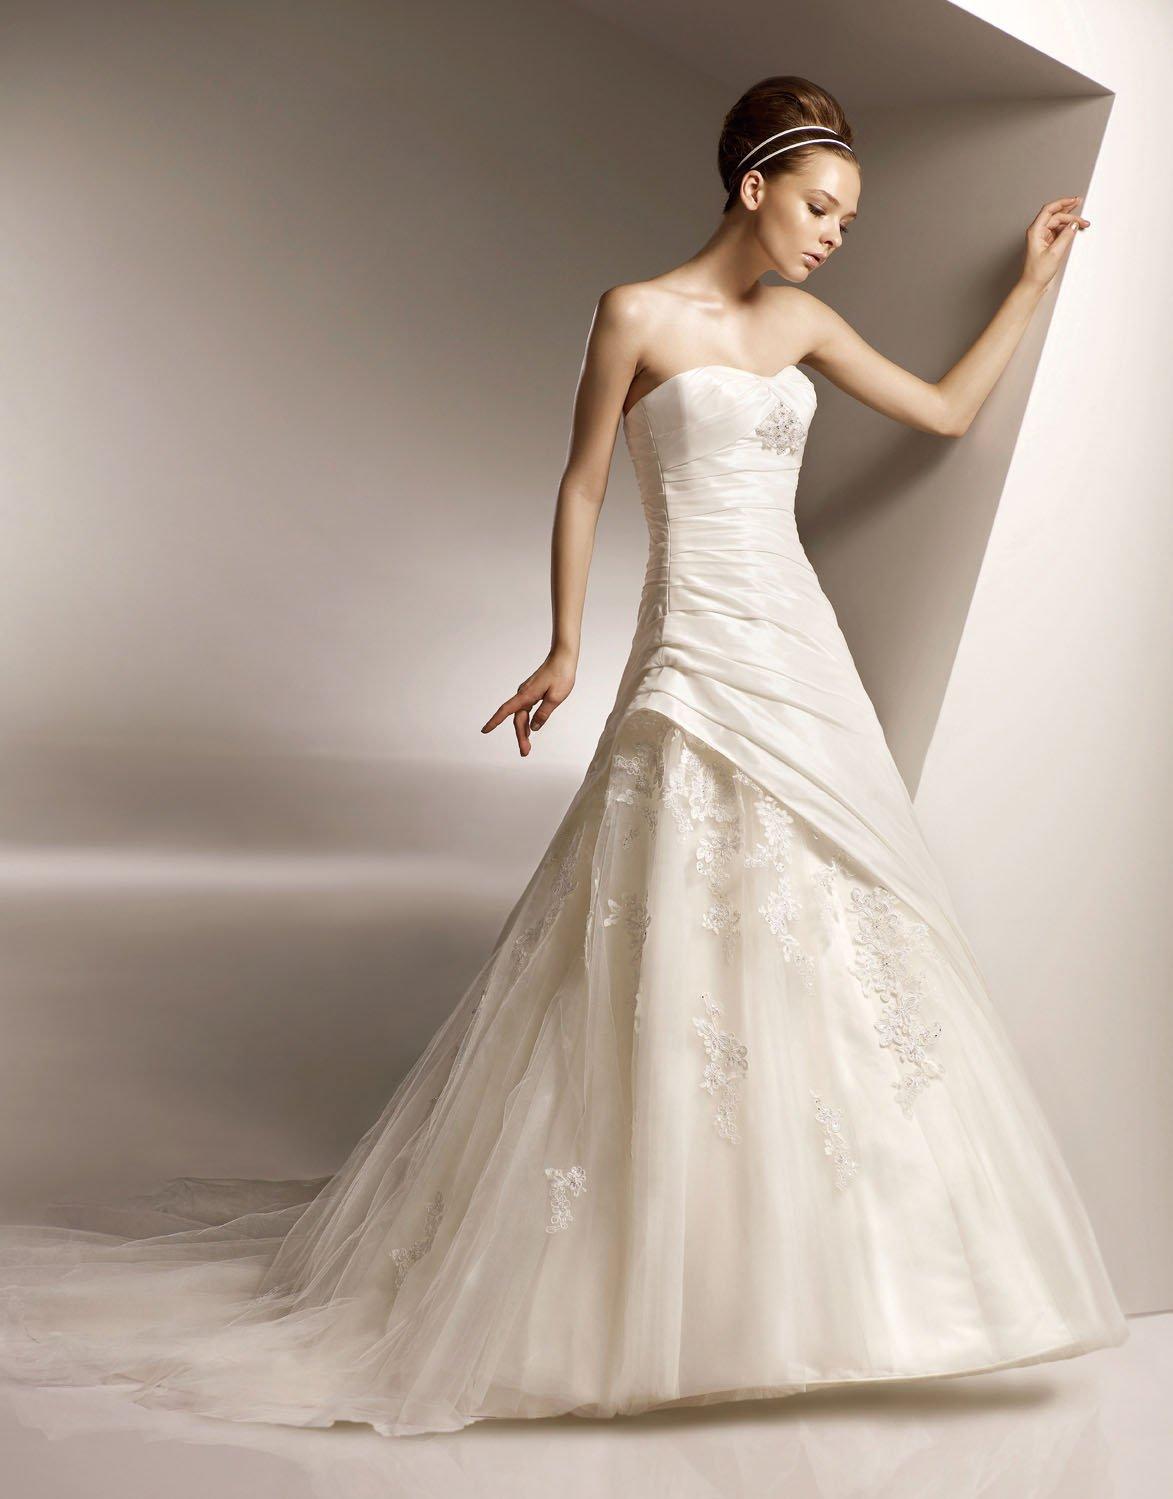 Scoop Neckline Strapless Appliqued Taffeta and Tuller  Wedding Dress Bridal Gown